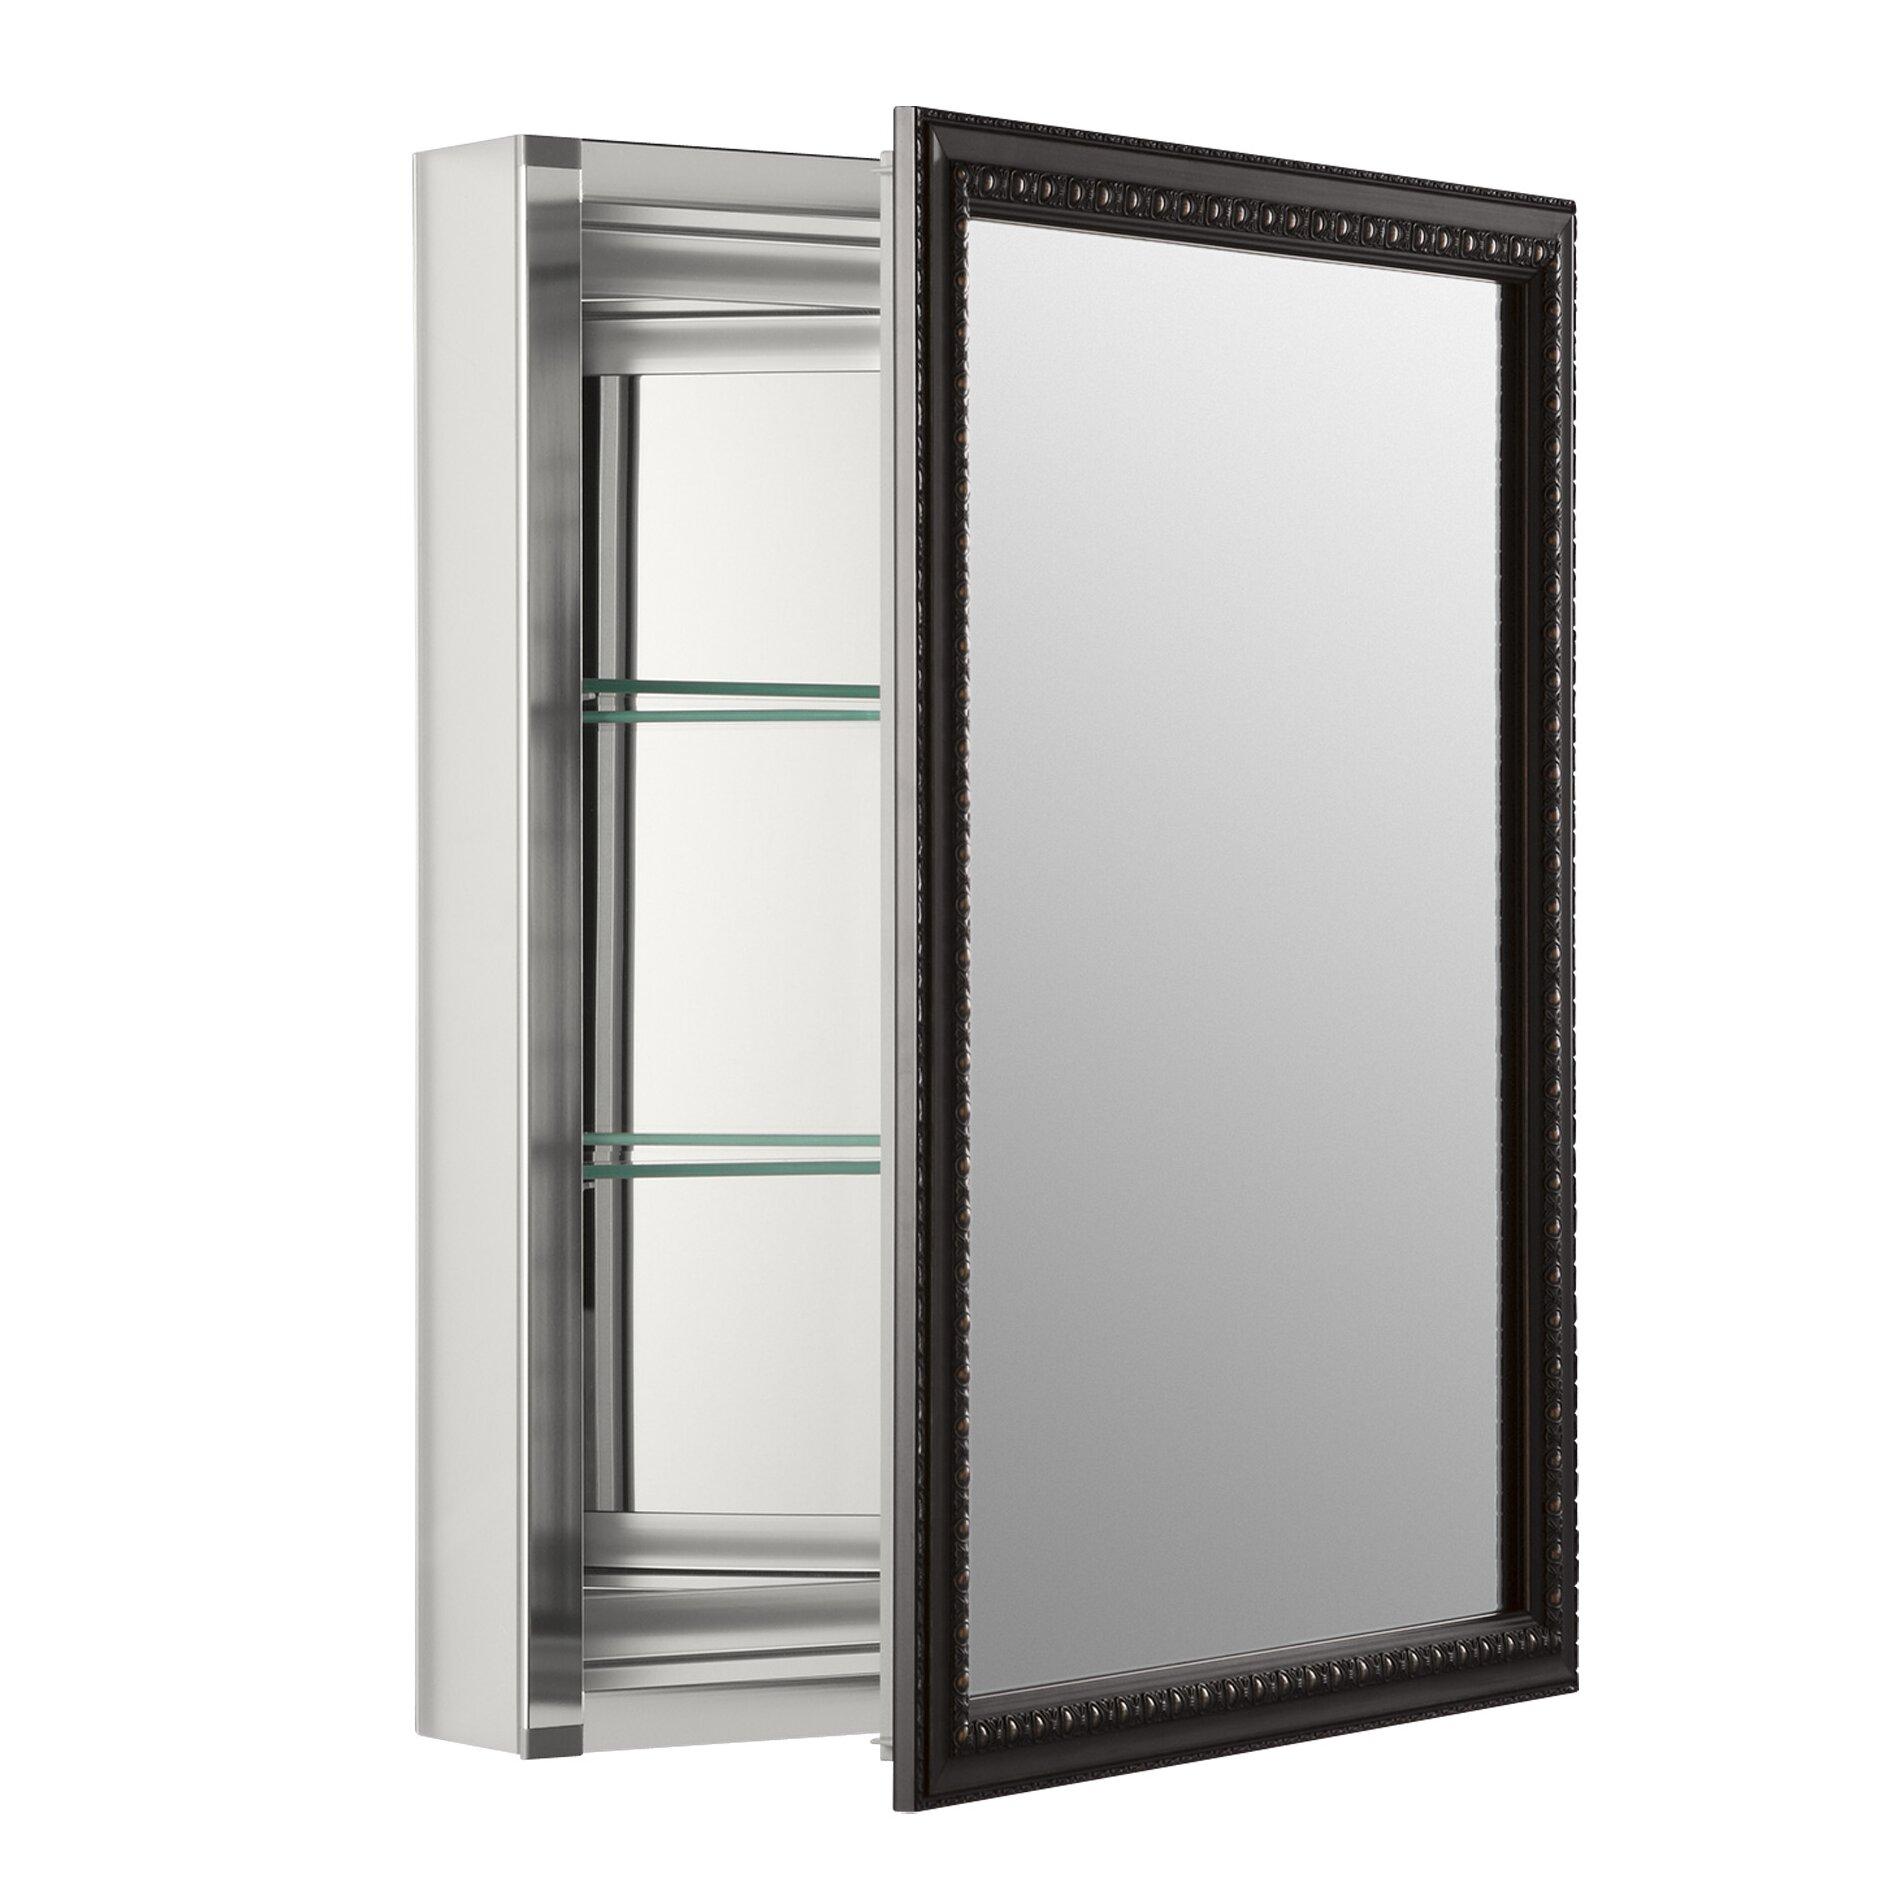 Bathroom mirror with shelf uk - Affordable Luxury Bathrooms